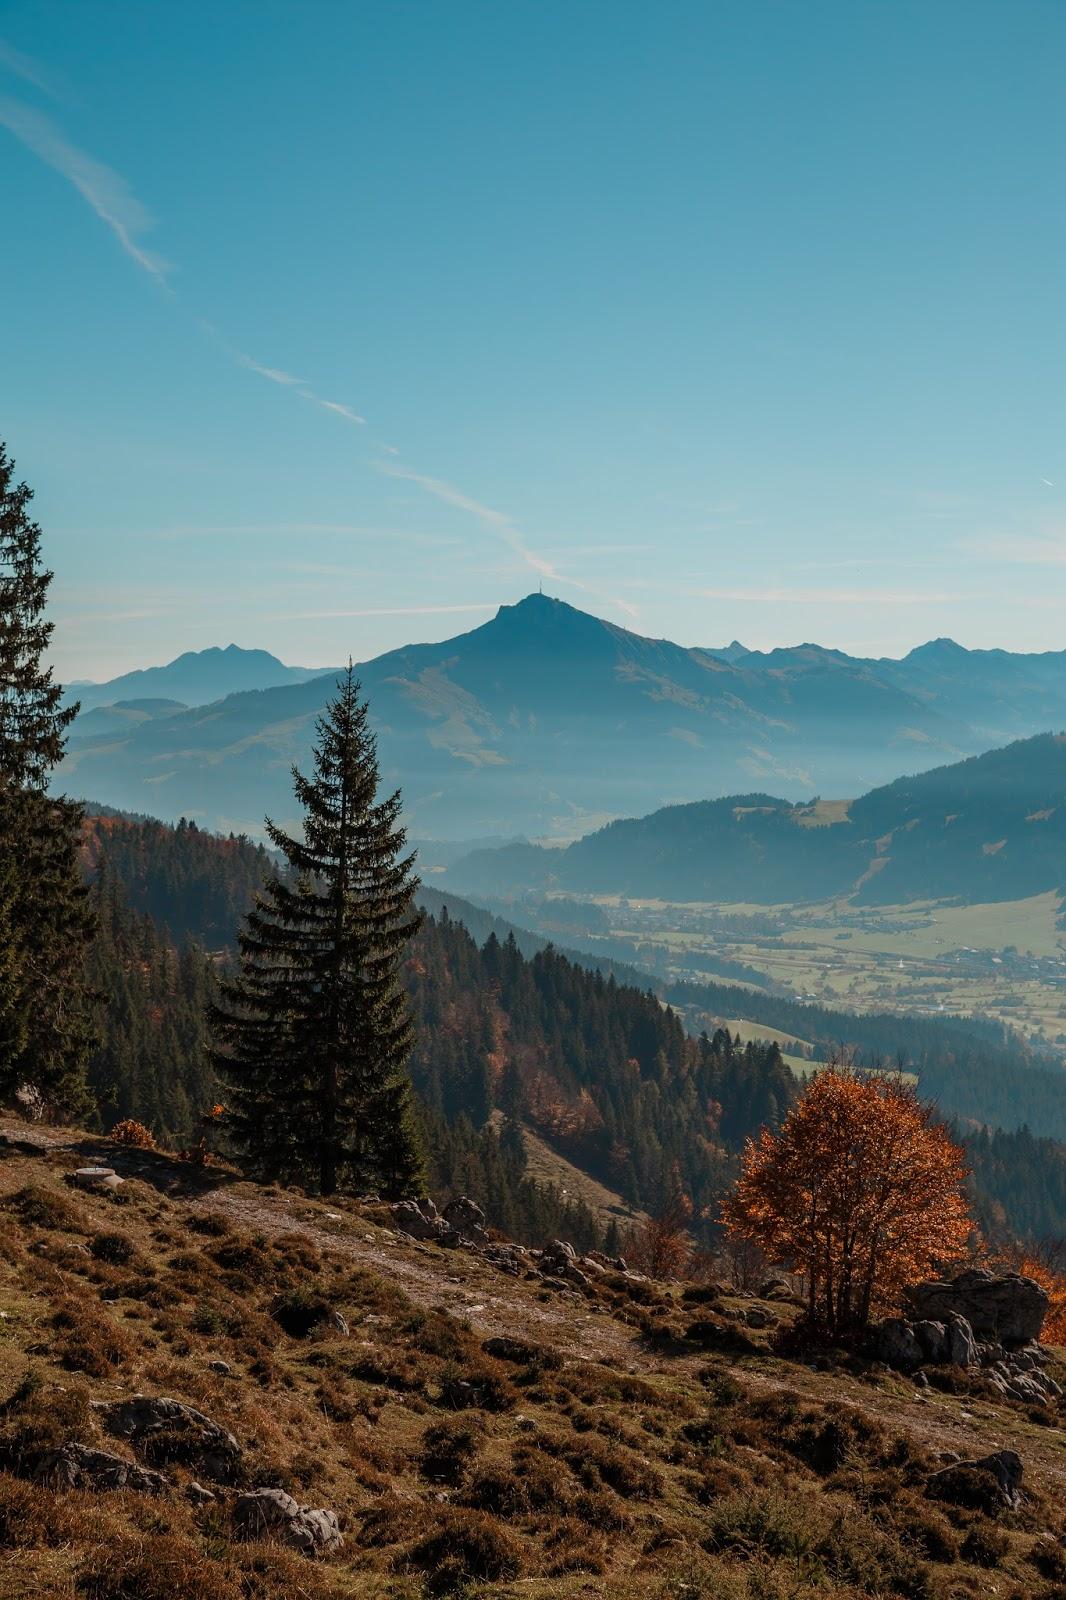 Bergtour Scheffauer  Wandern Wilder Kaiser  leichter Gipfel im Wilden Kaiser  Wandern-Tirol 03